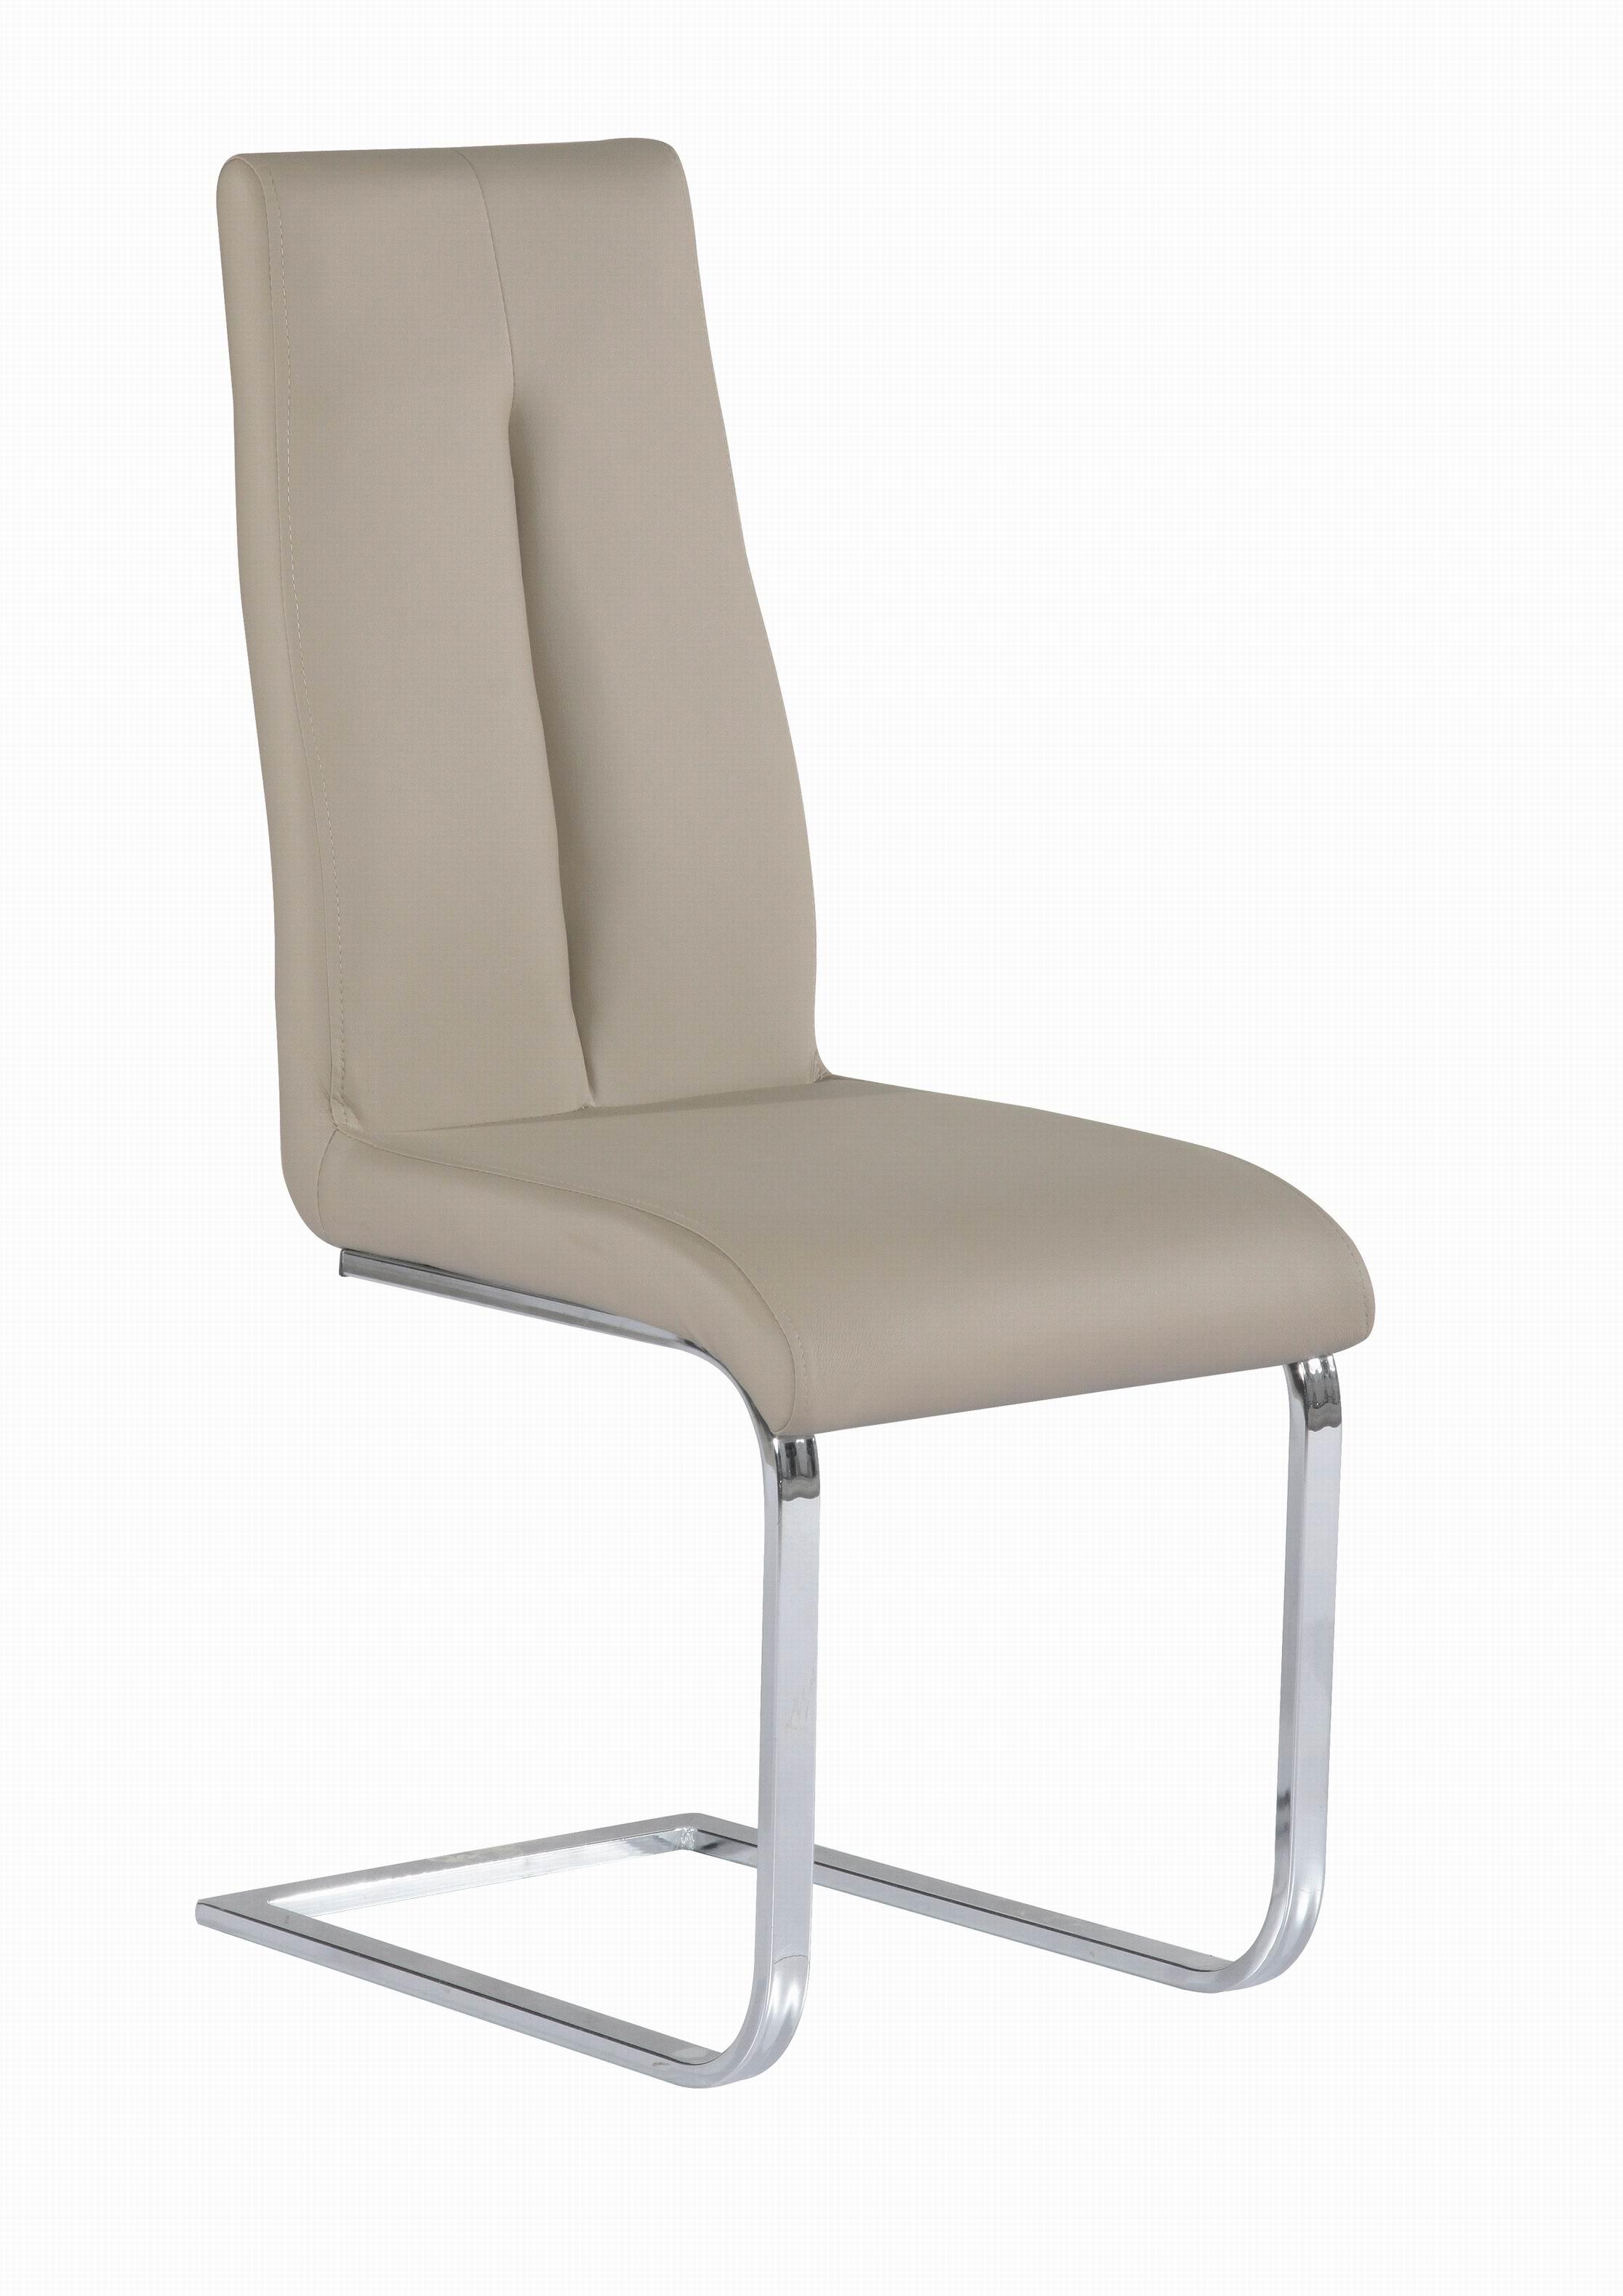 Comfortable Dining Chairs  stevieawardsjapan